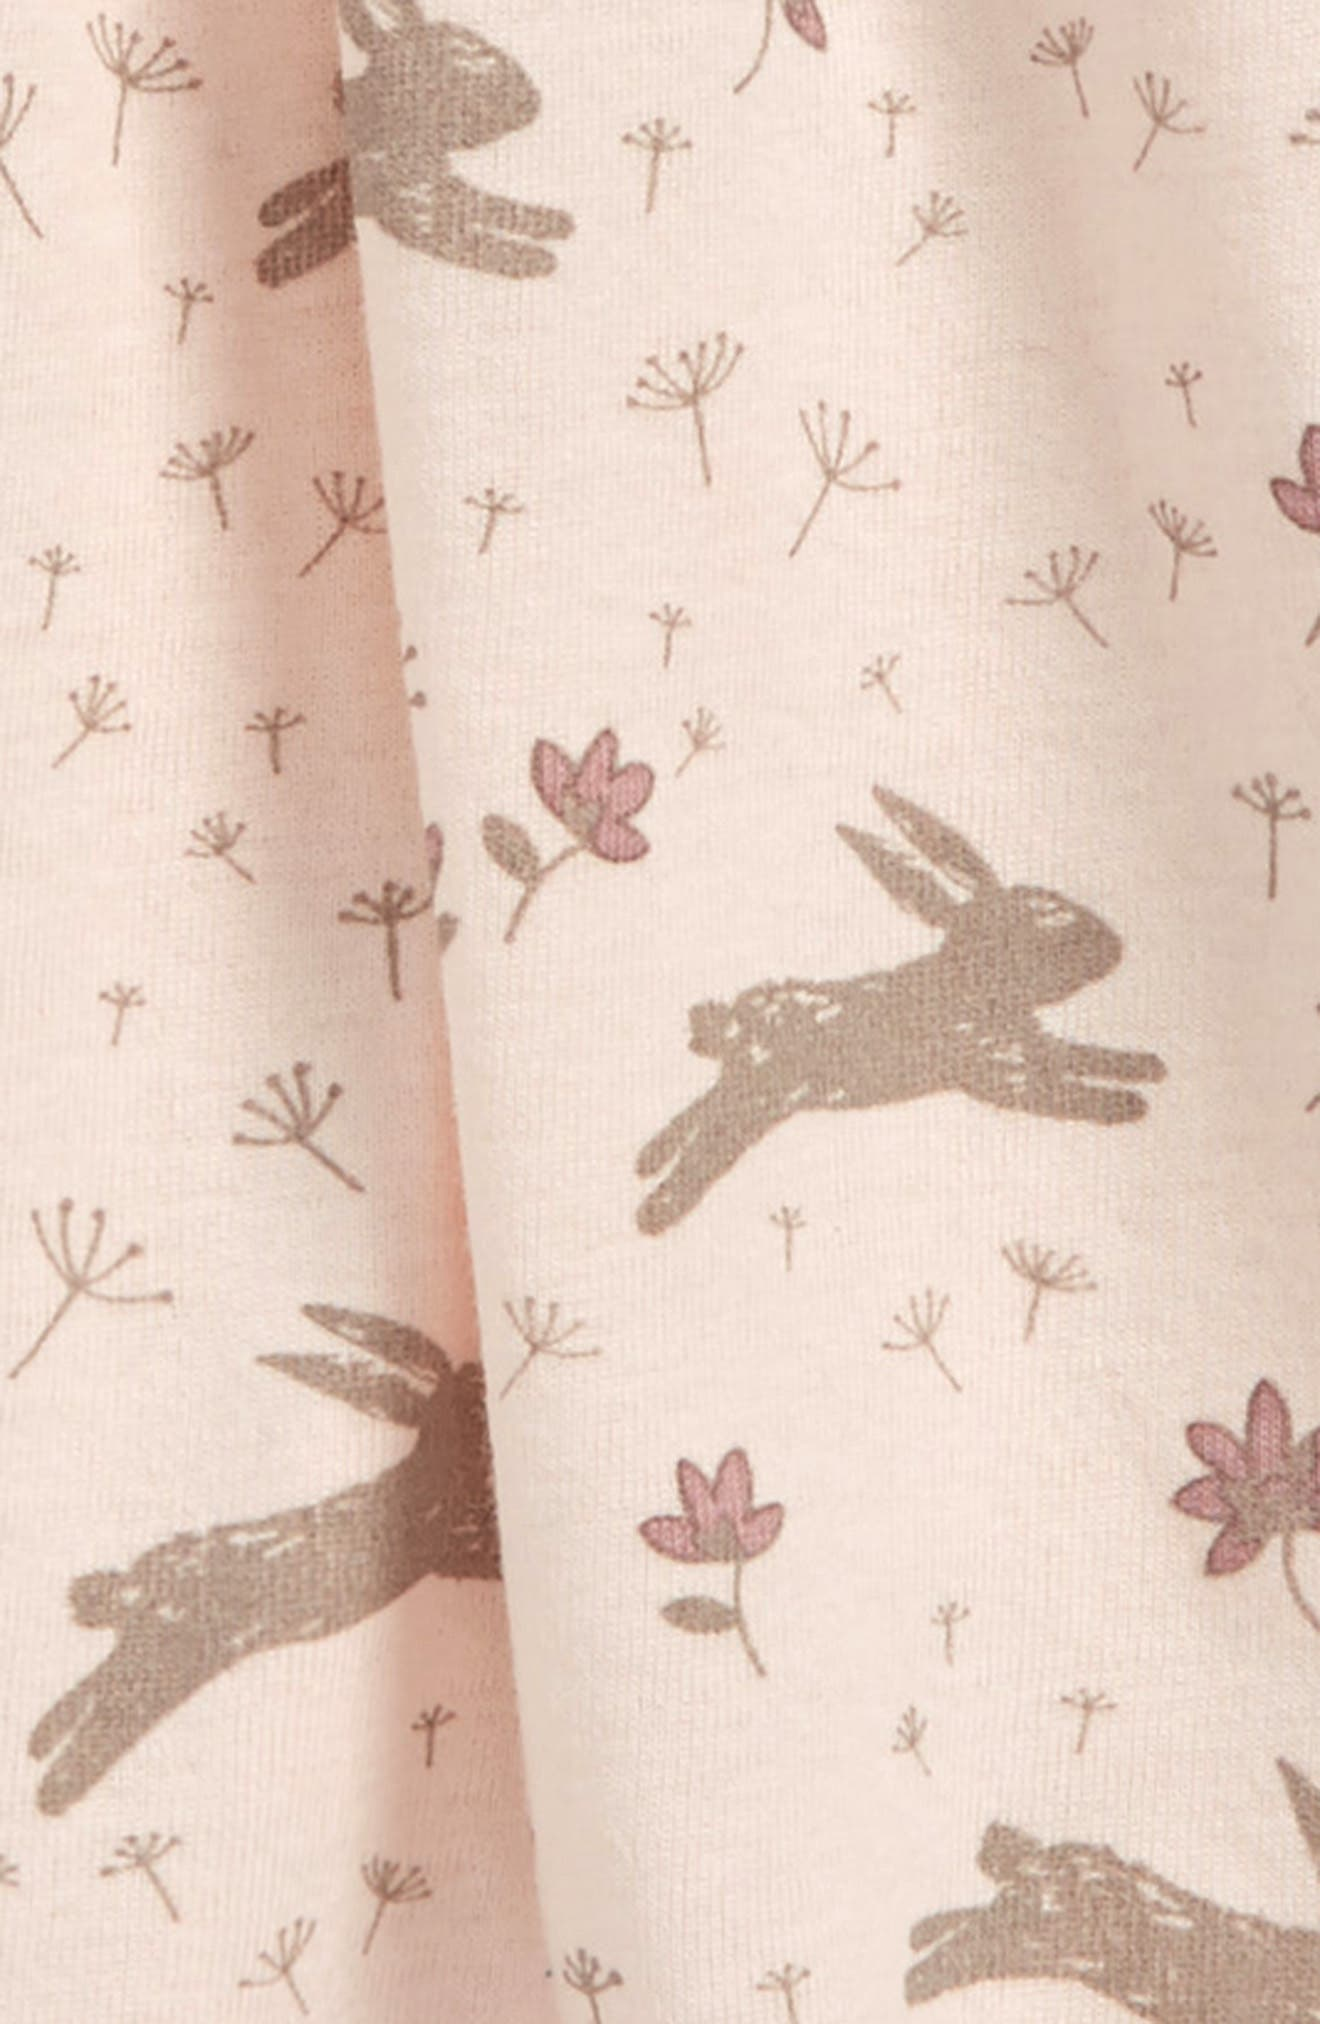 Peek Bunny Dress,                             Alternate thumbnail 2, color,                             Light Pink